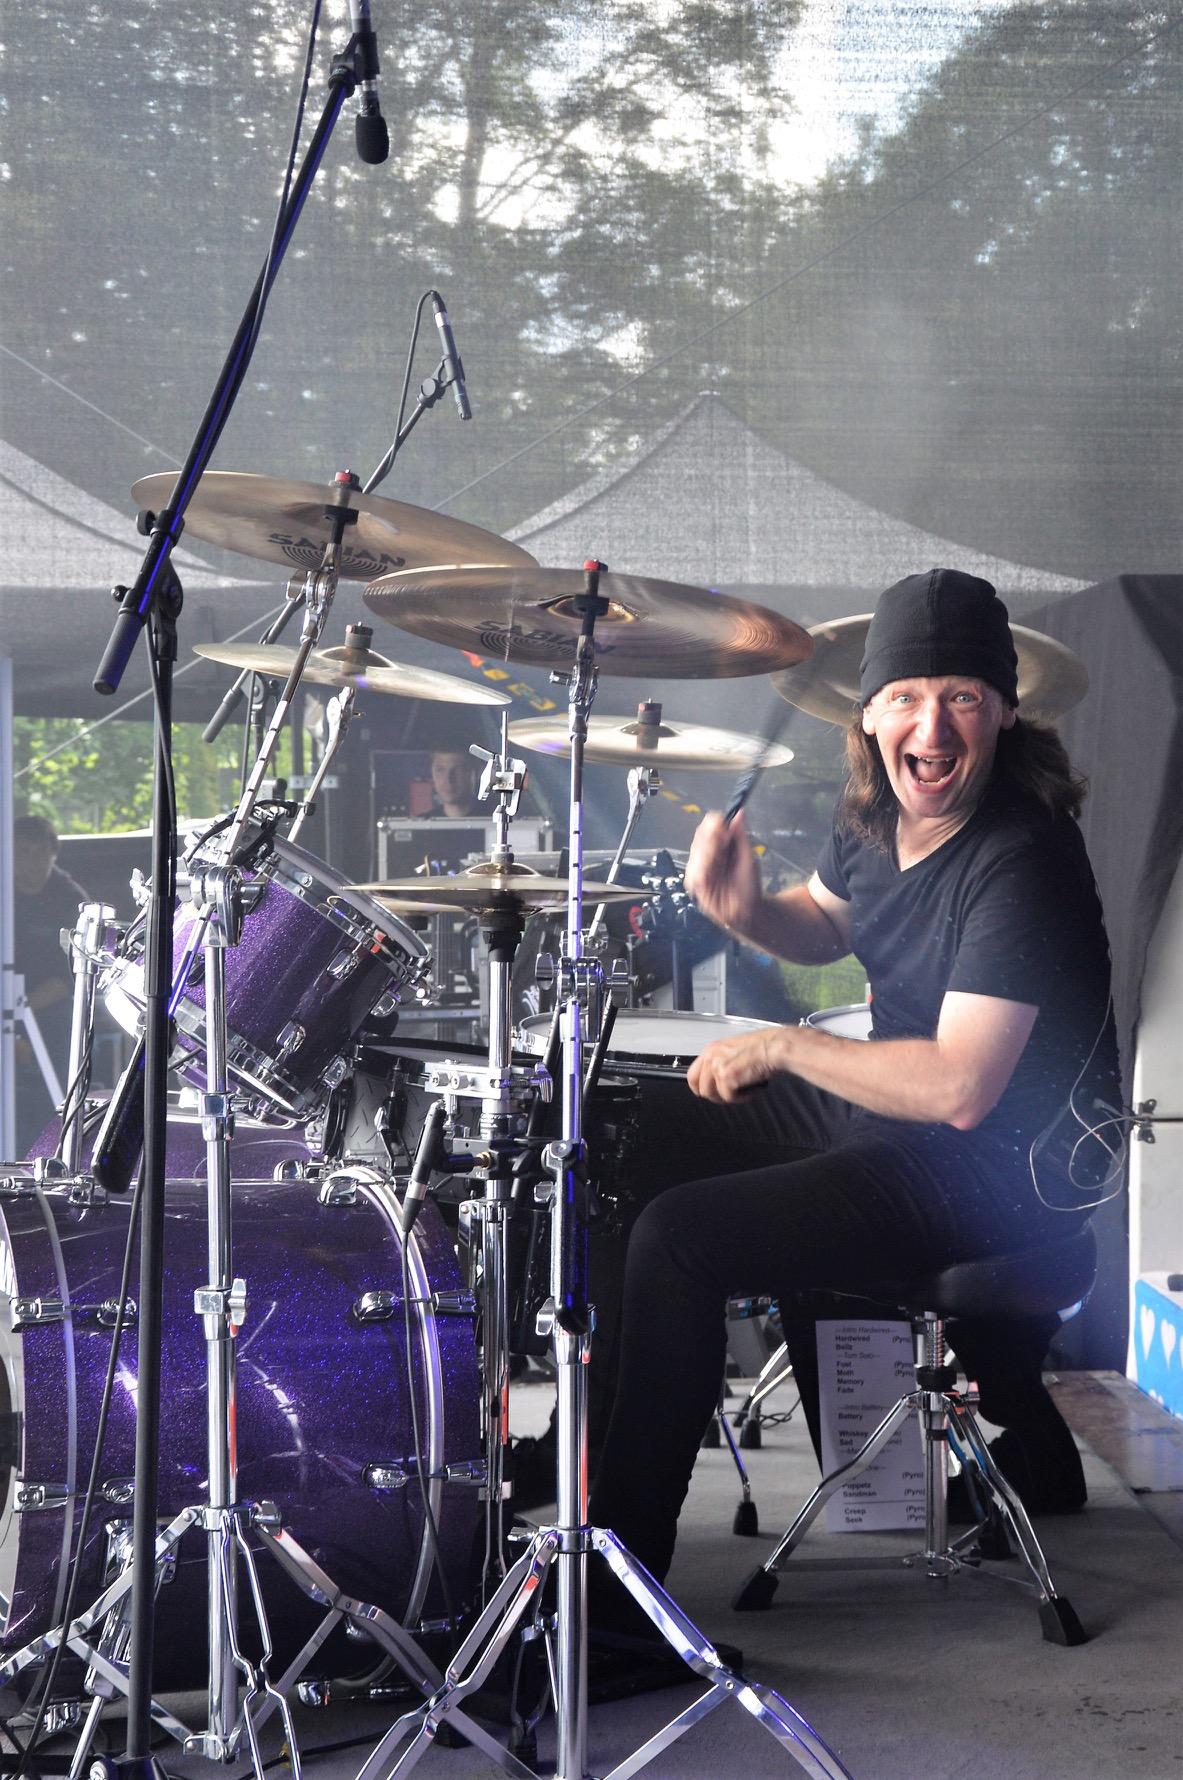 mytallica-dortmund-rock-n-tribute-festival-2017-tama-drums-purple-stephan-zender